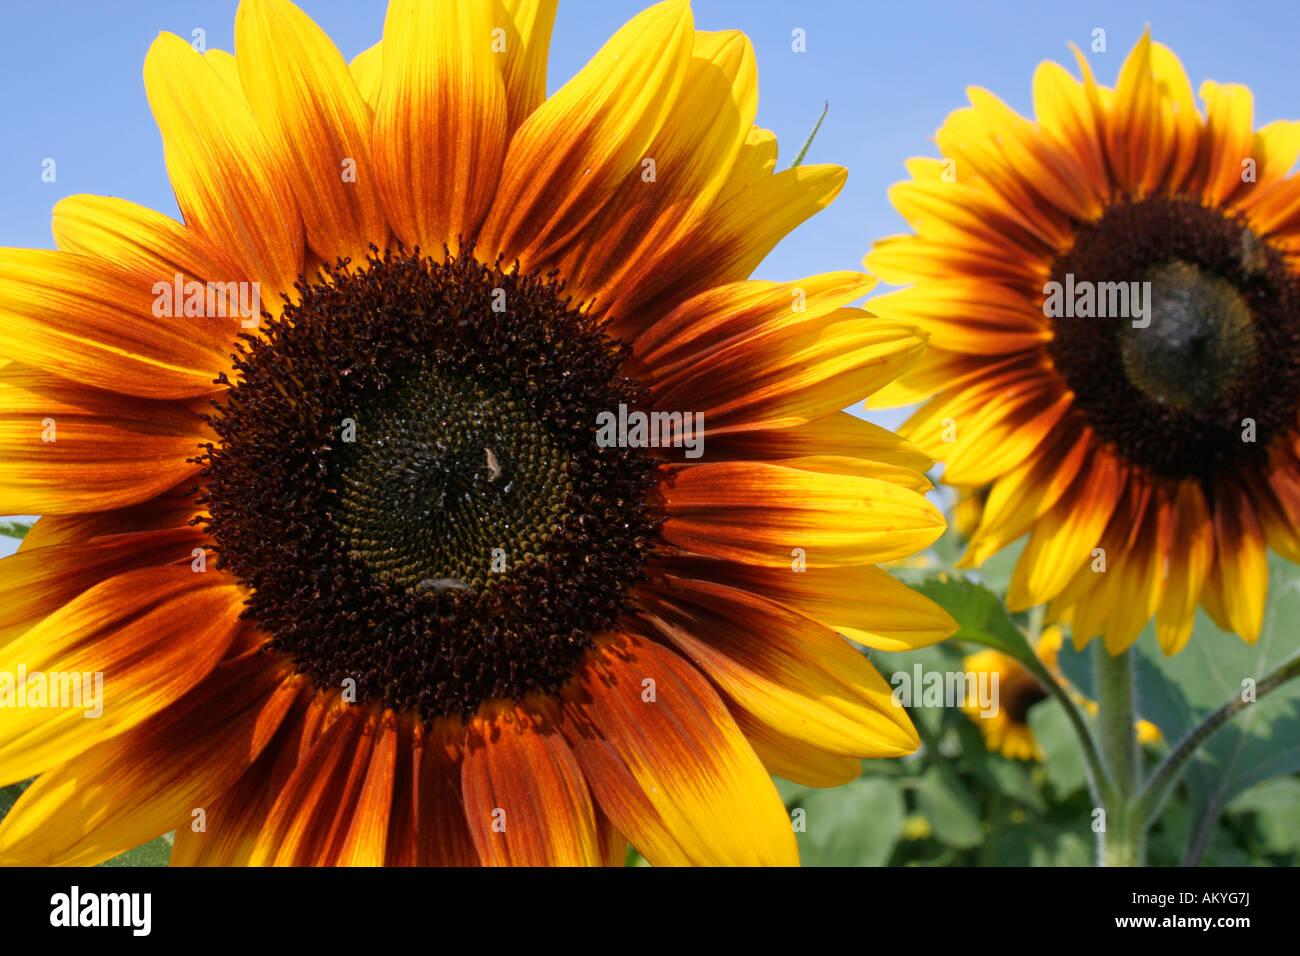 Sunflower, (Helianthus annuus) - Stock Image